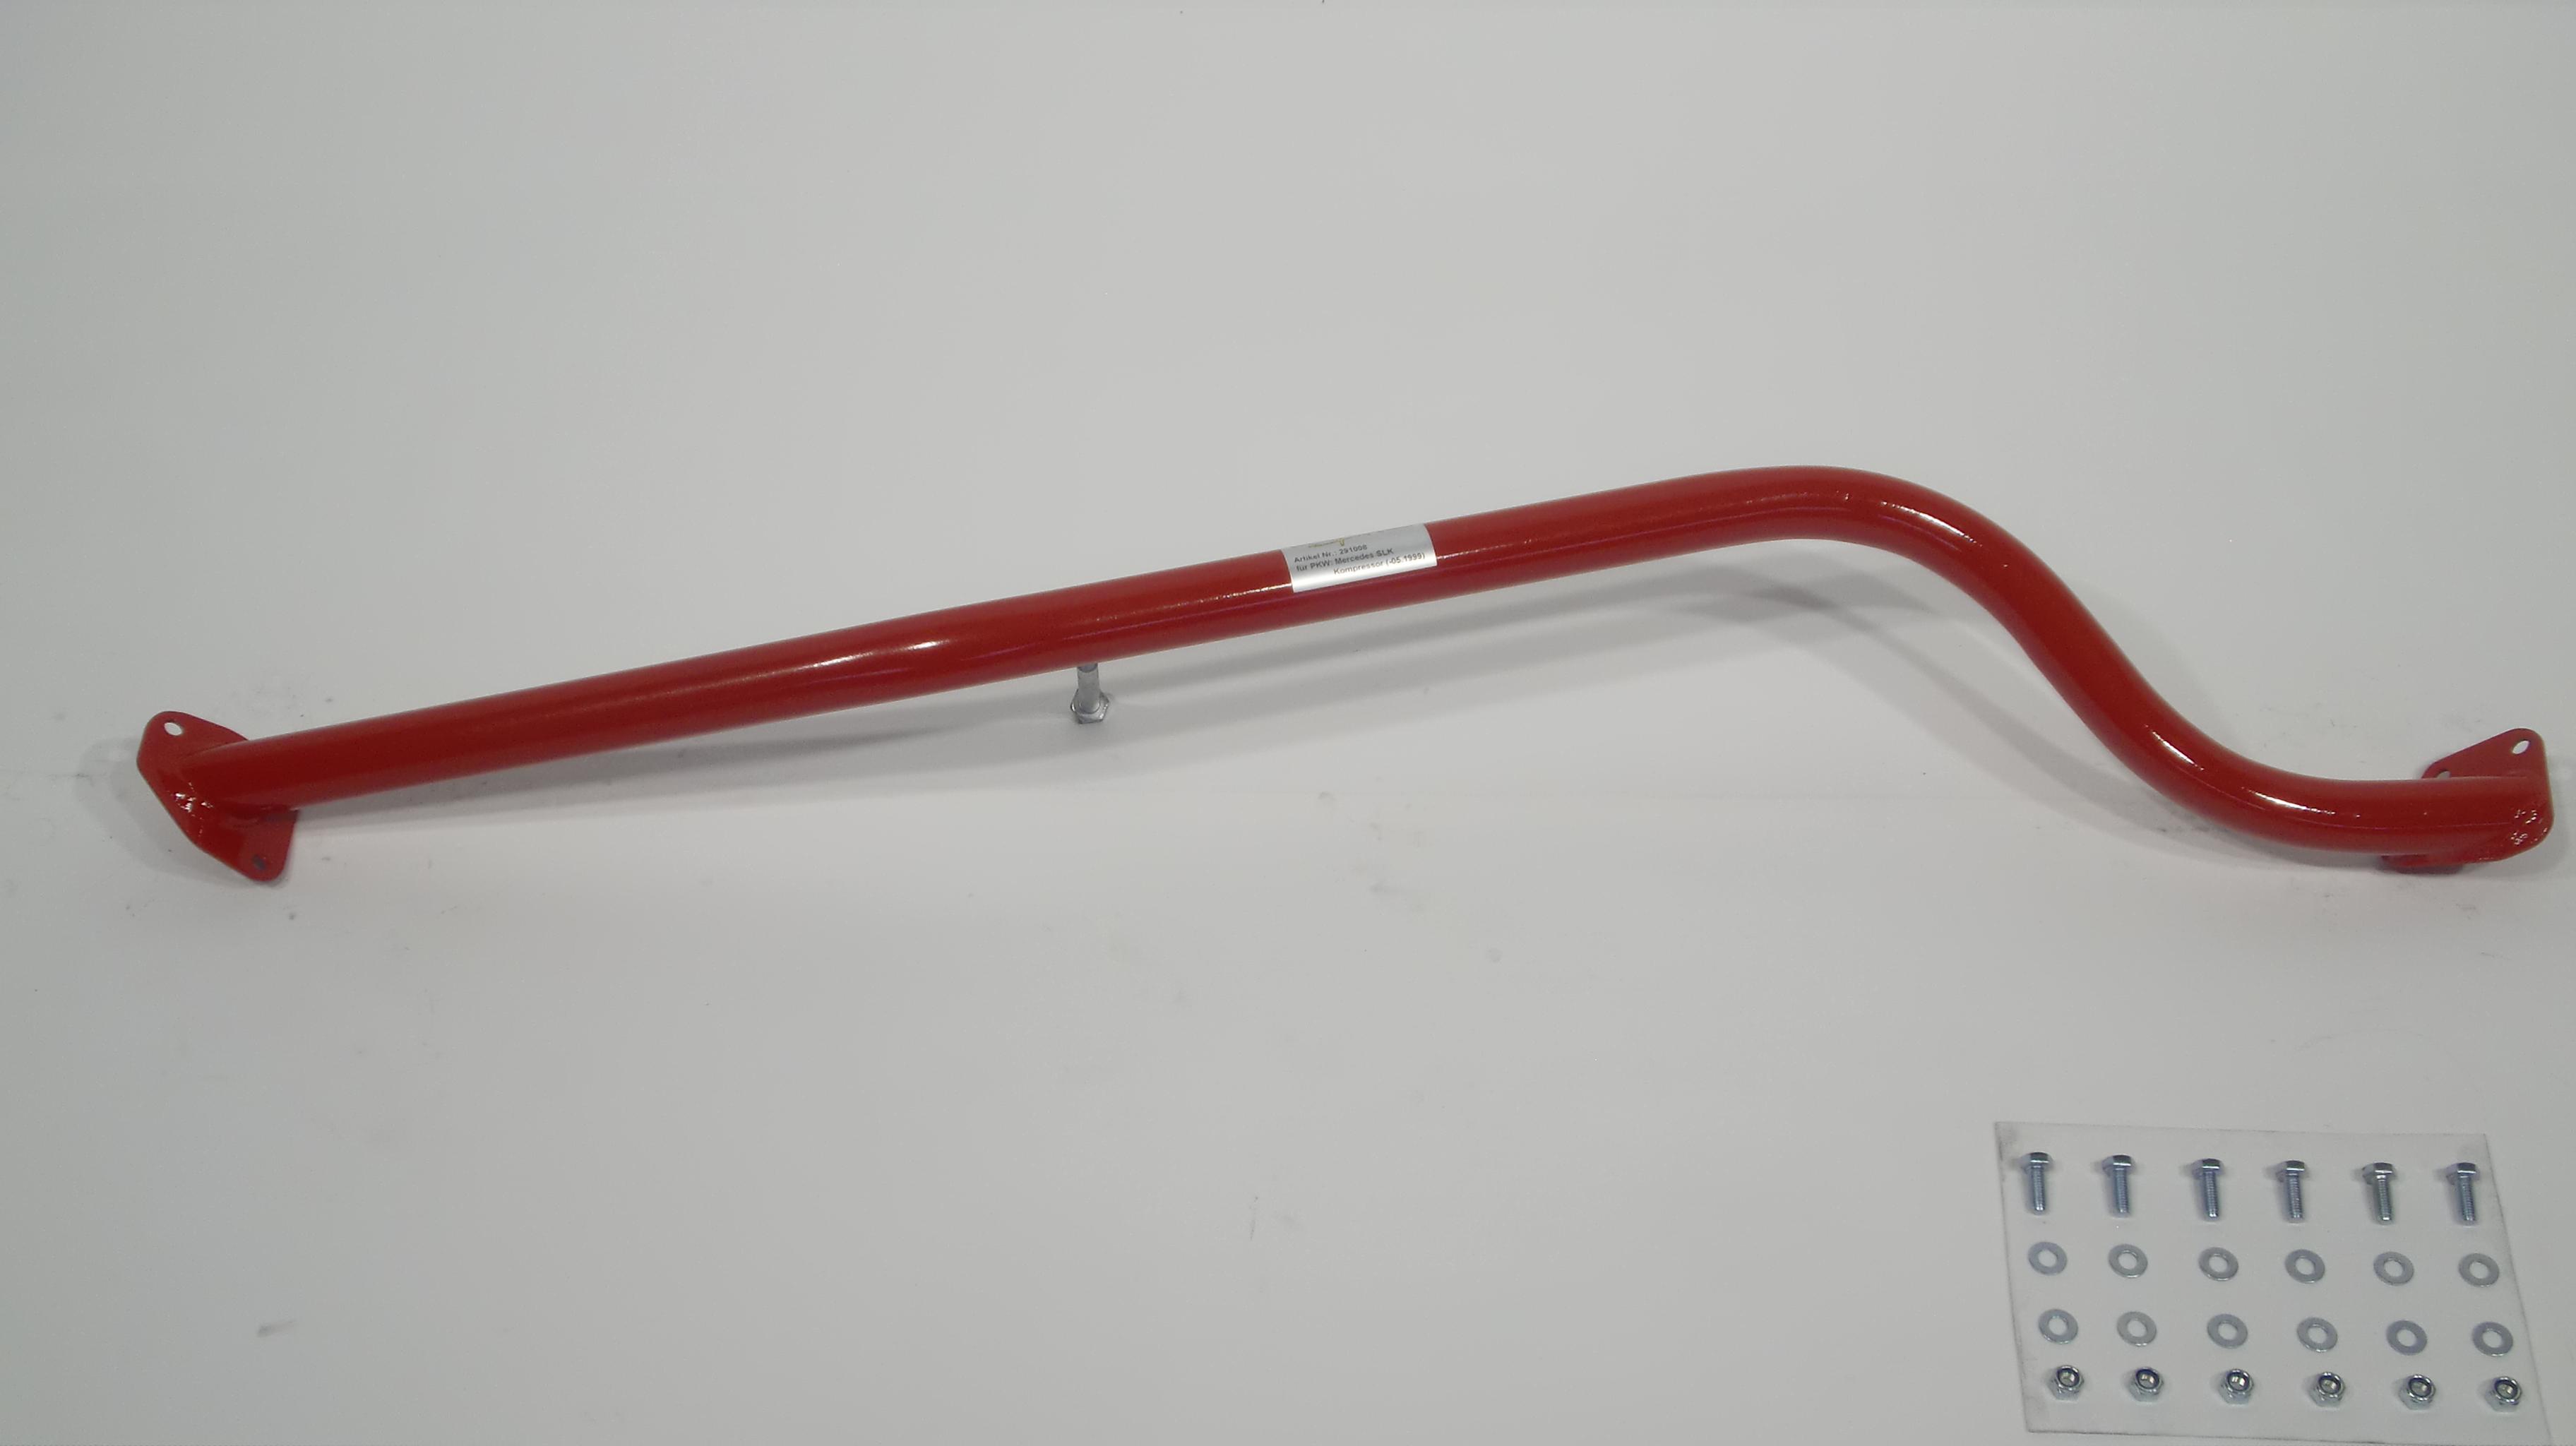 Wiechers 291008 Domstrebe Stahl vorne oben für Mercedes SLK Kompressor R170